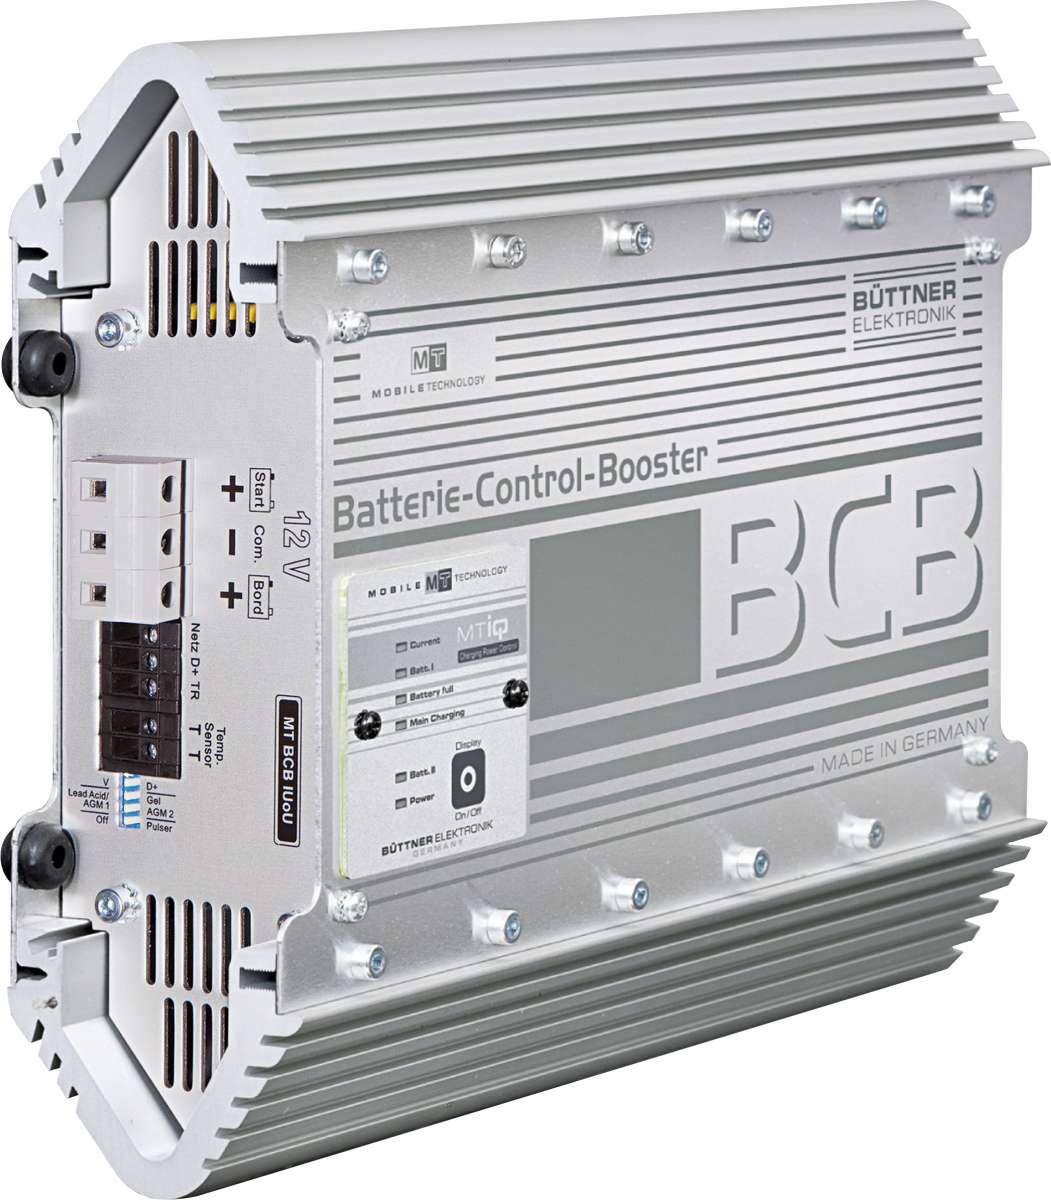 Batterie-Control-Booster MT BCB 40/40 IUoU   Elektro, Energieversorgung, Batterien & Ladegeräte